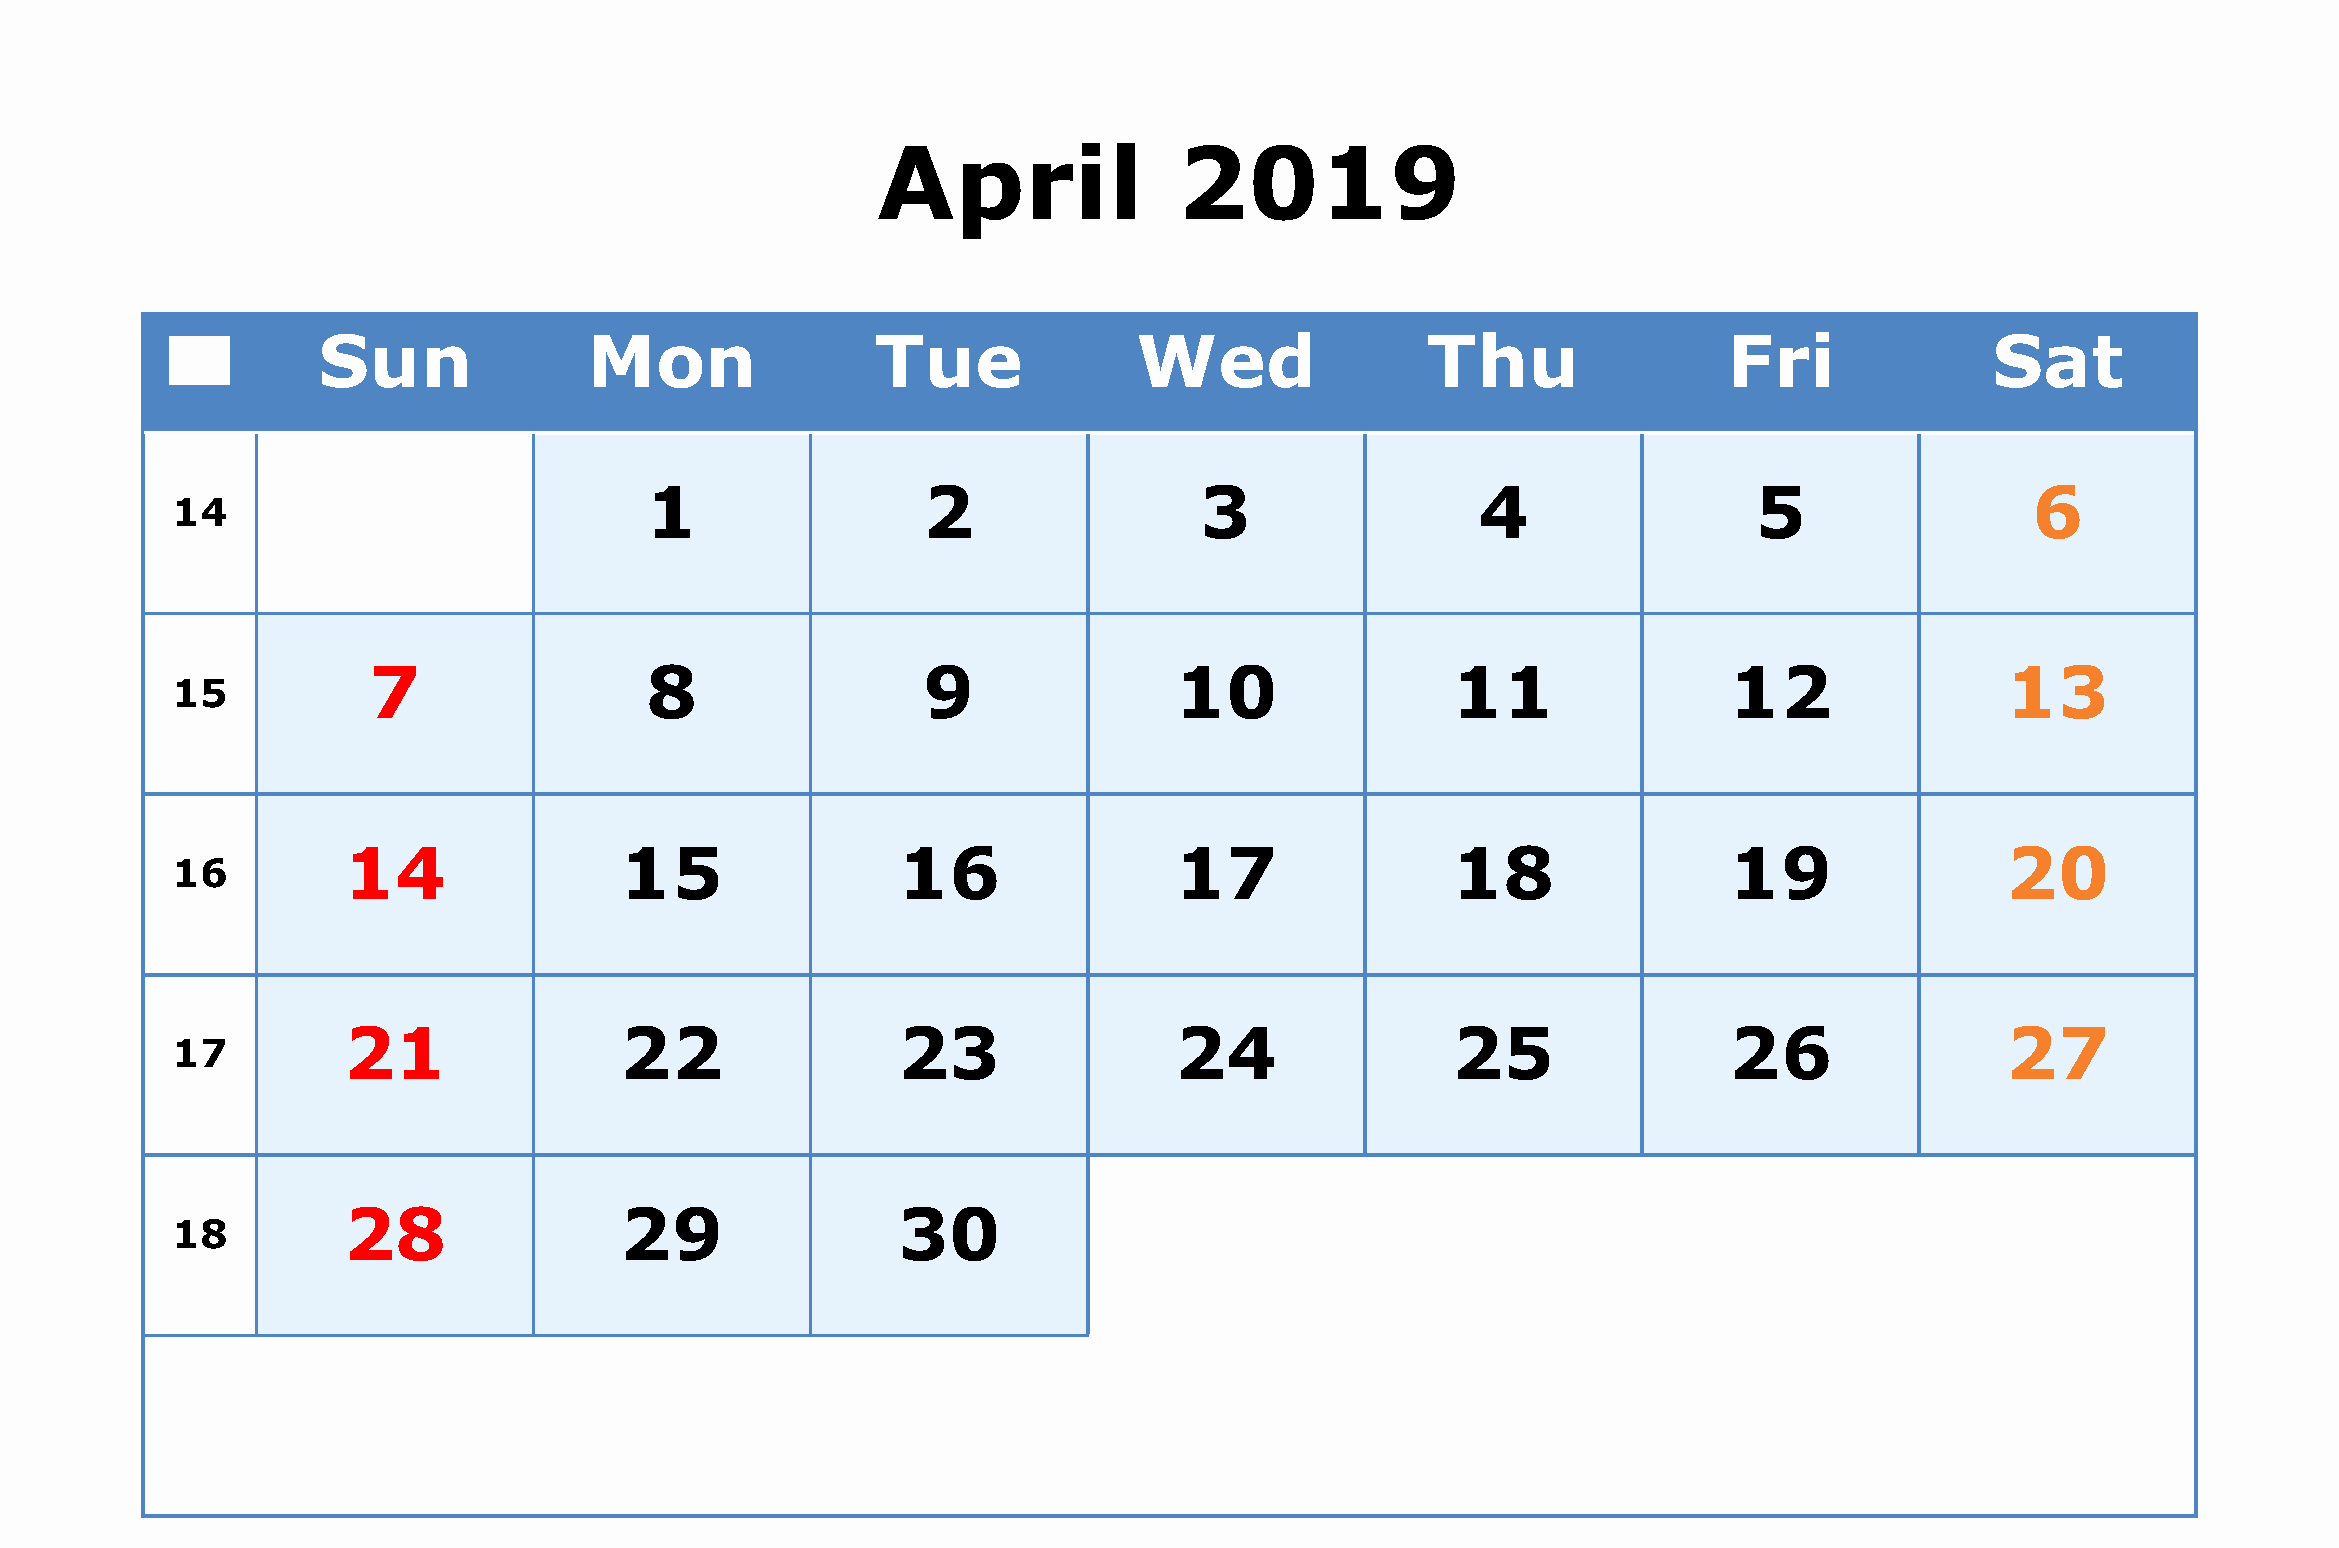 2019 Word Calendar with Holidays Best Of April 2019 Calendar Word Printable Editable Blank Template